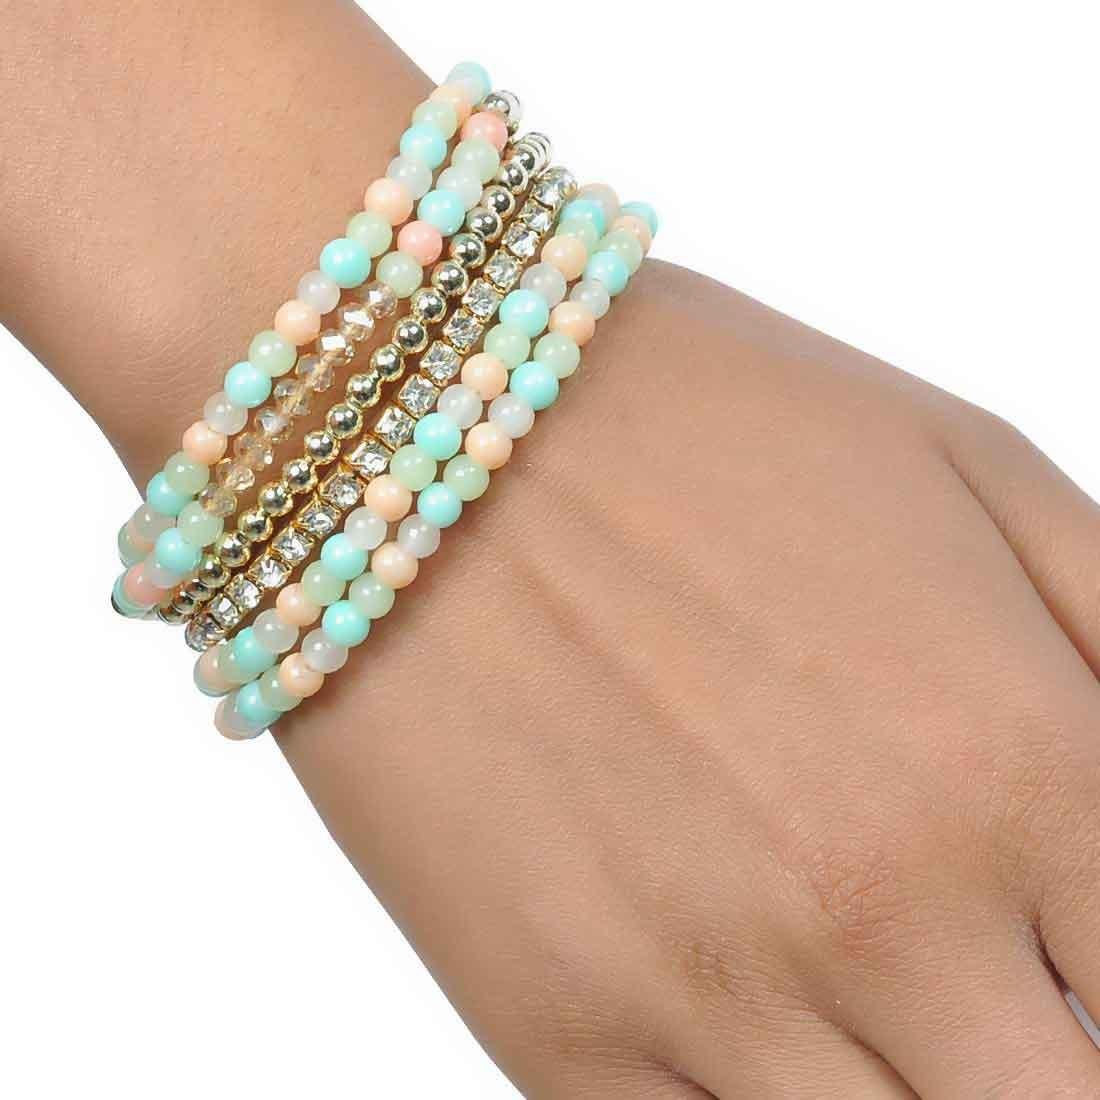 Suave Multicolor Contemporary Adjustable College Bracelet Alloy Maayra MY6849